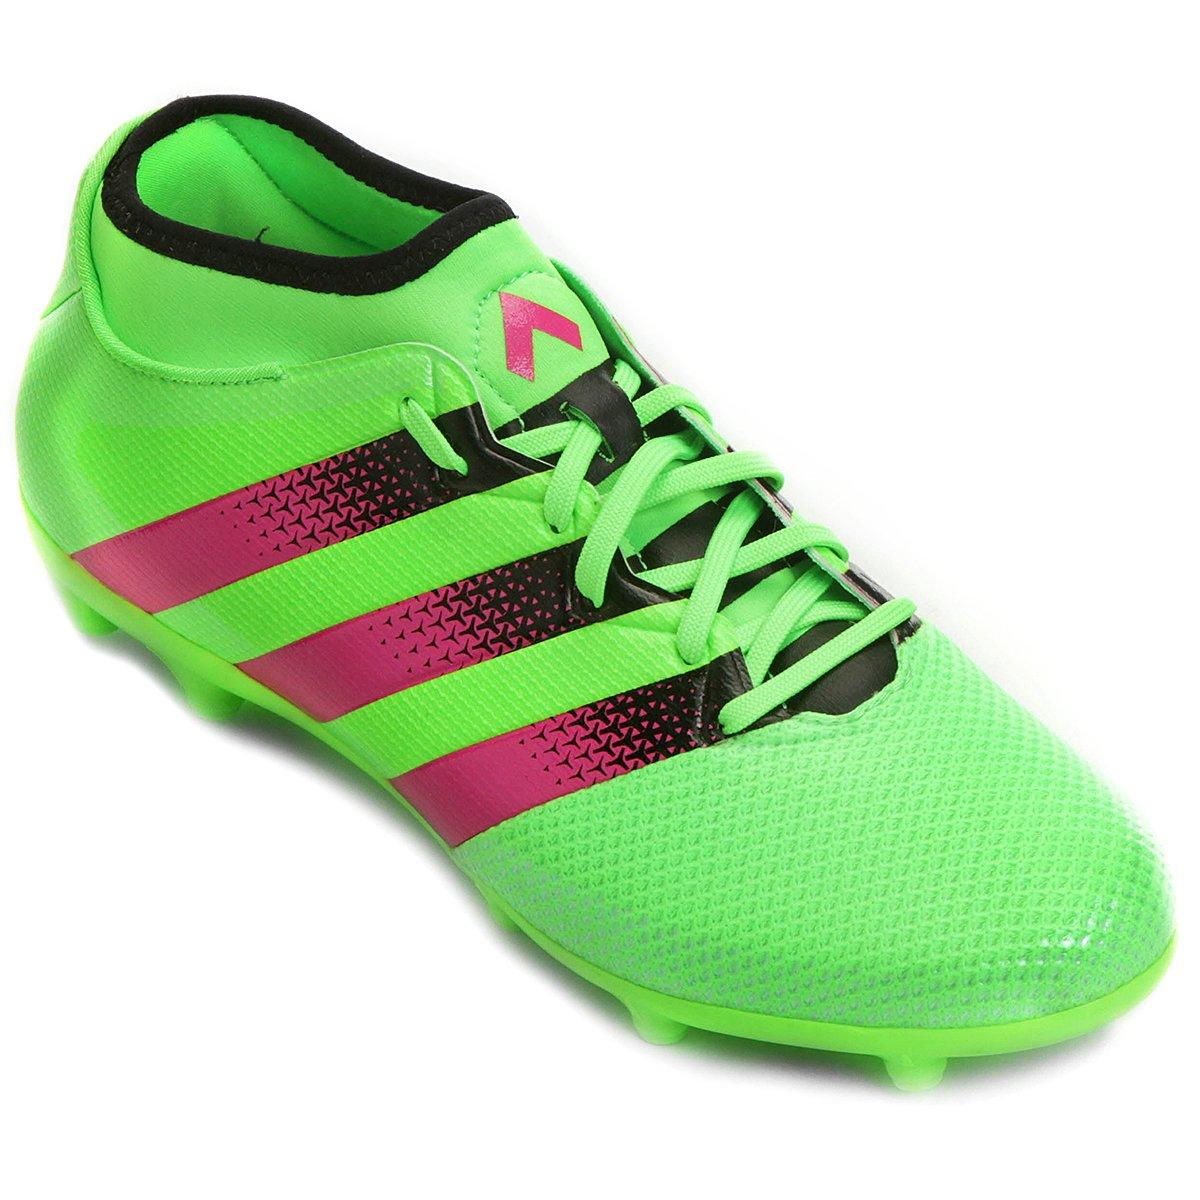 6ccfa746e2 Chuteira Campo Adidas Ace 16.3 Primemesh FG - Compre Agora